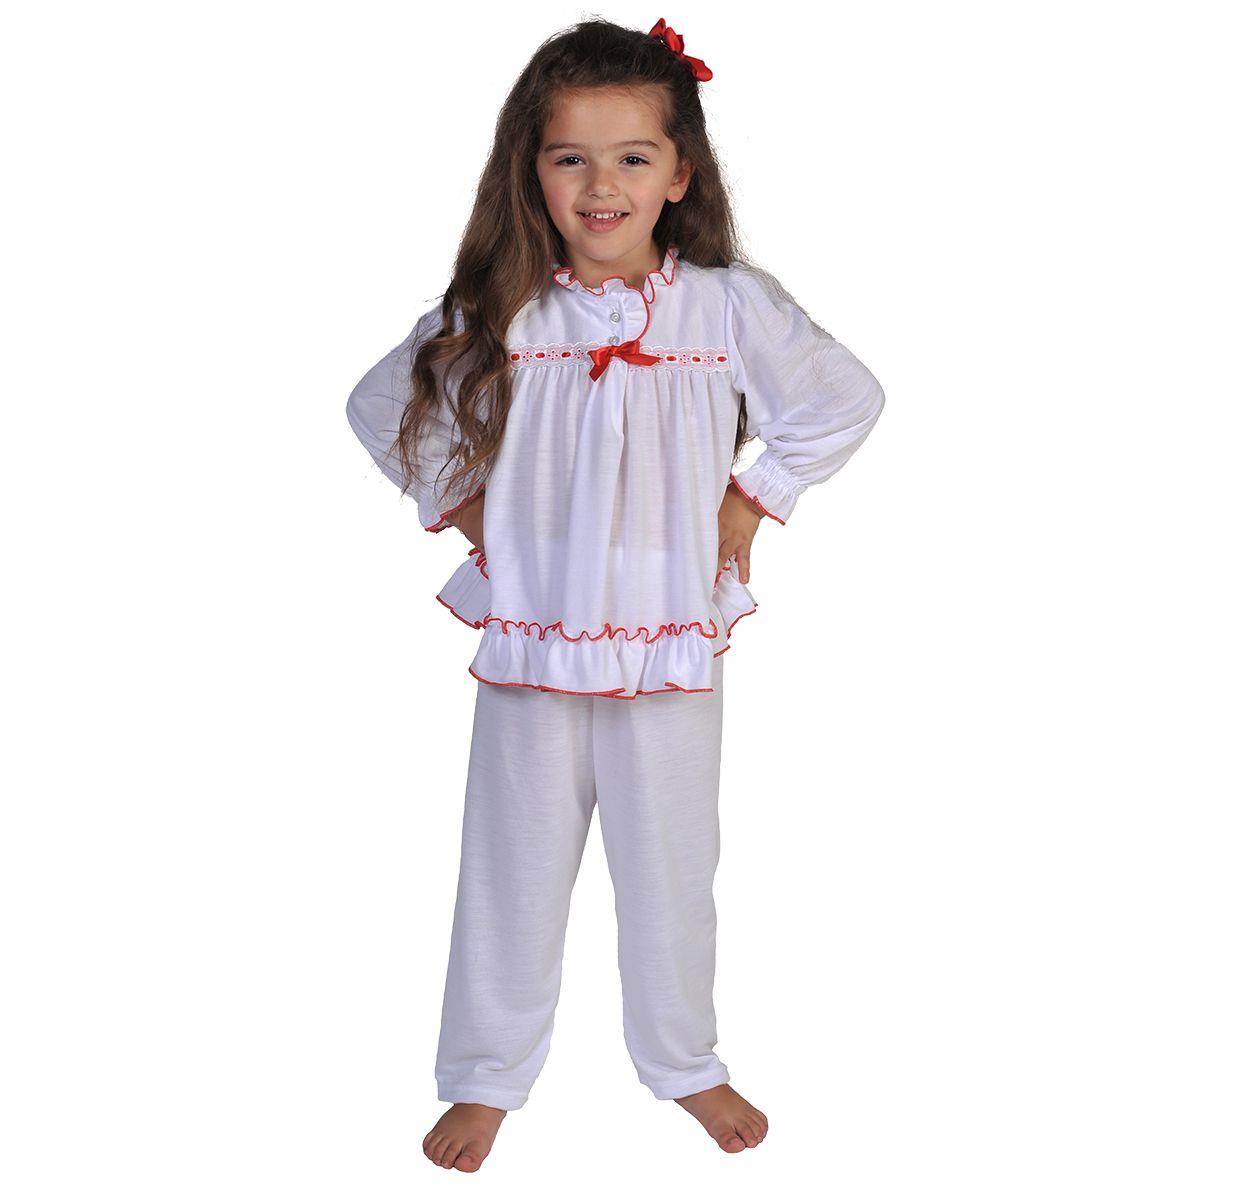 50b101803dc Clara s White Nightgown   PJ s